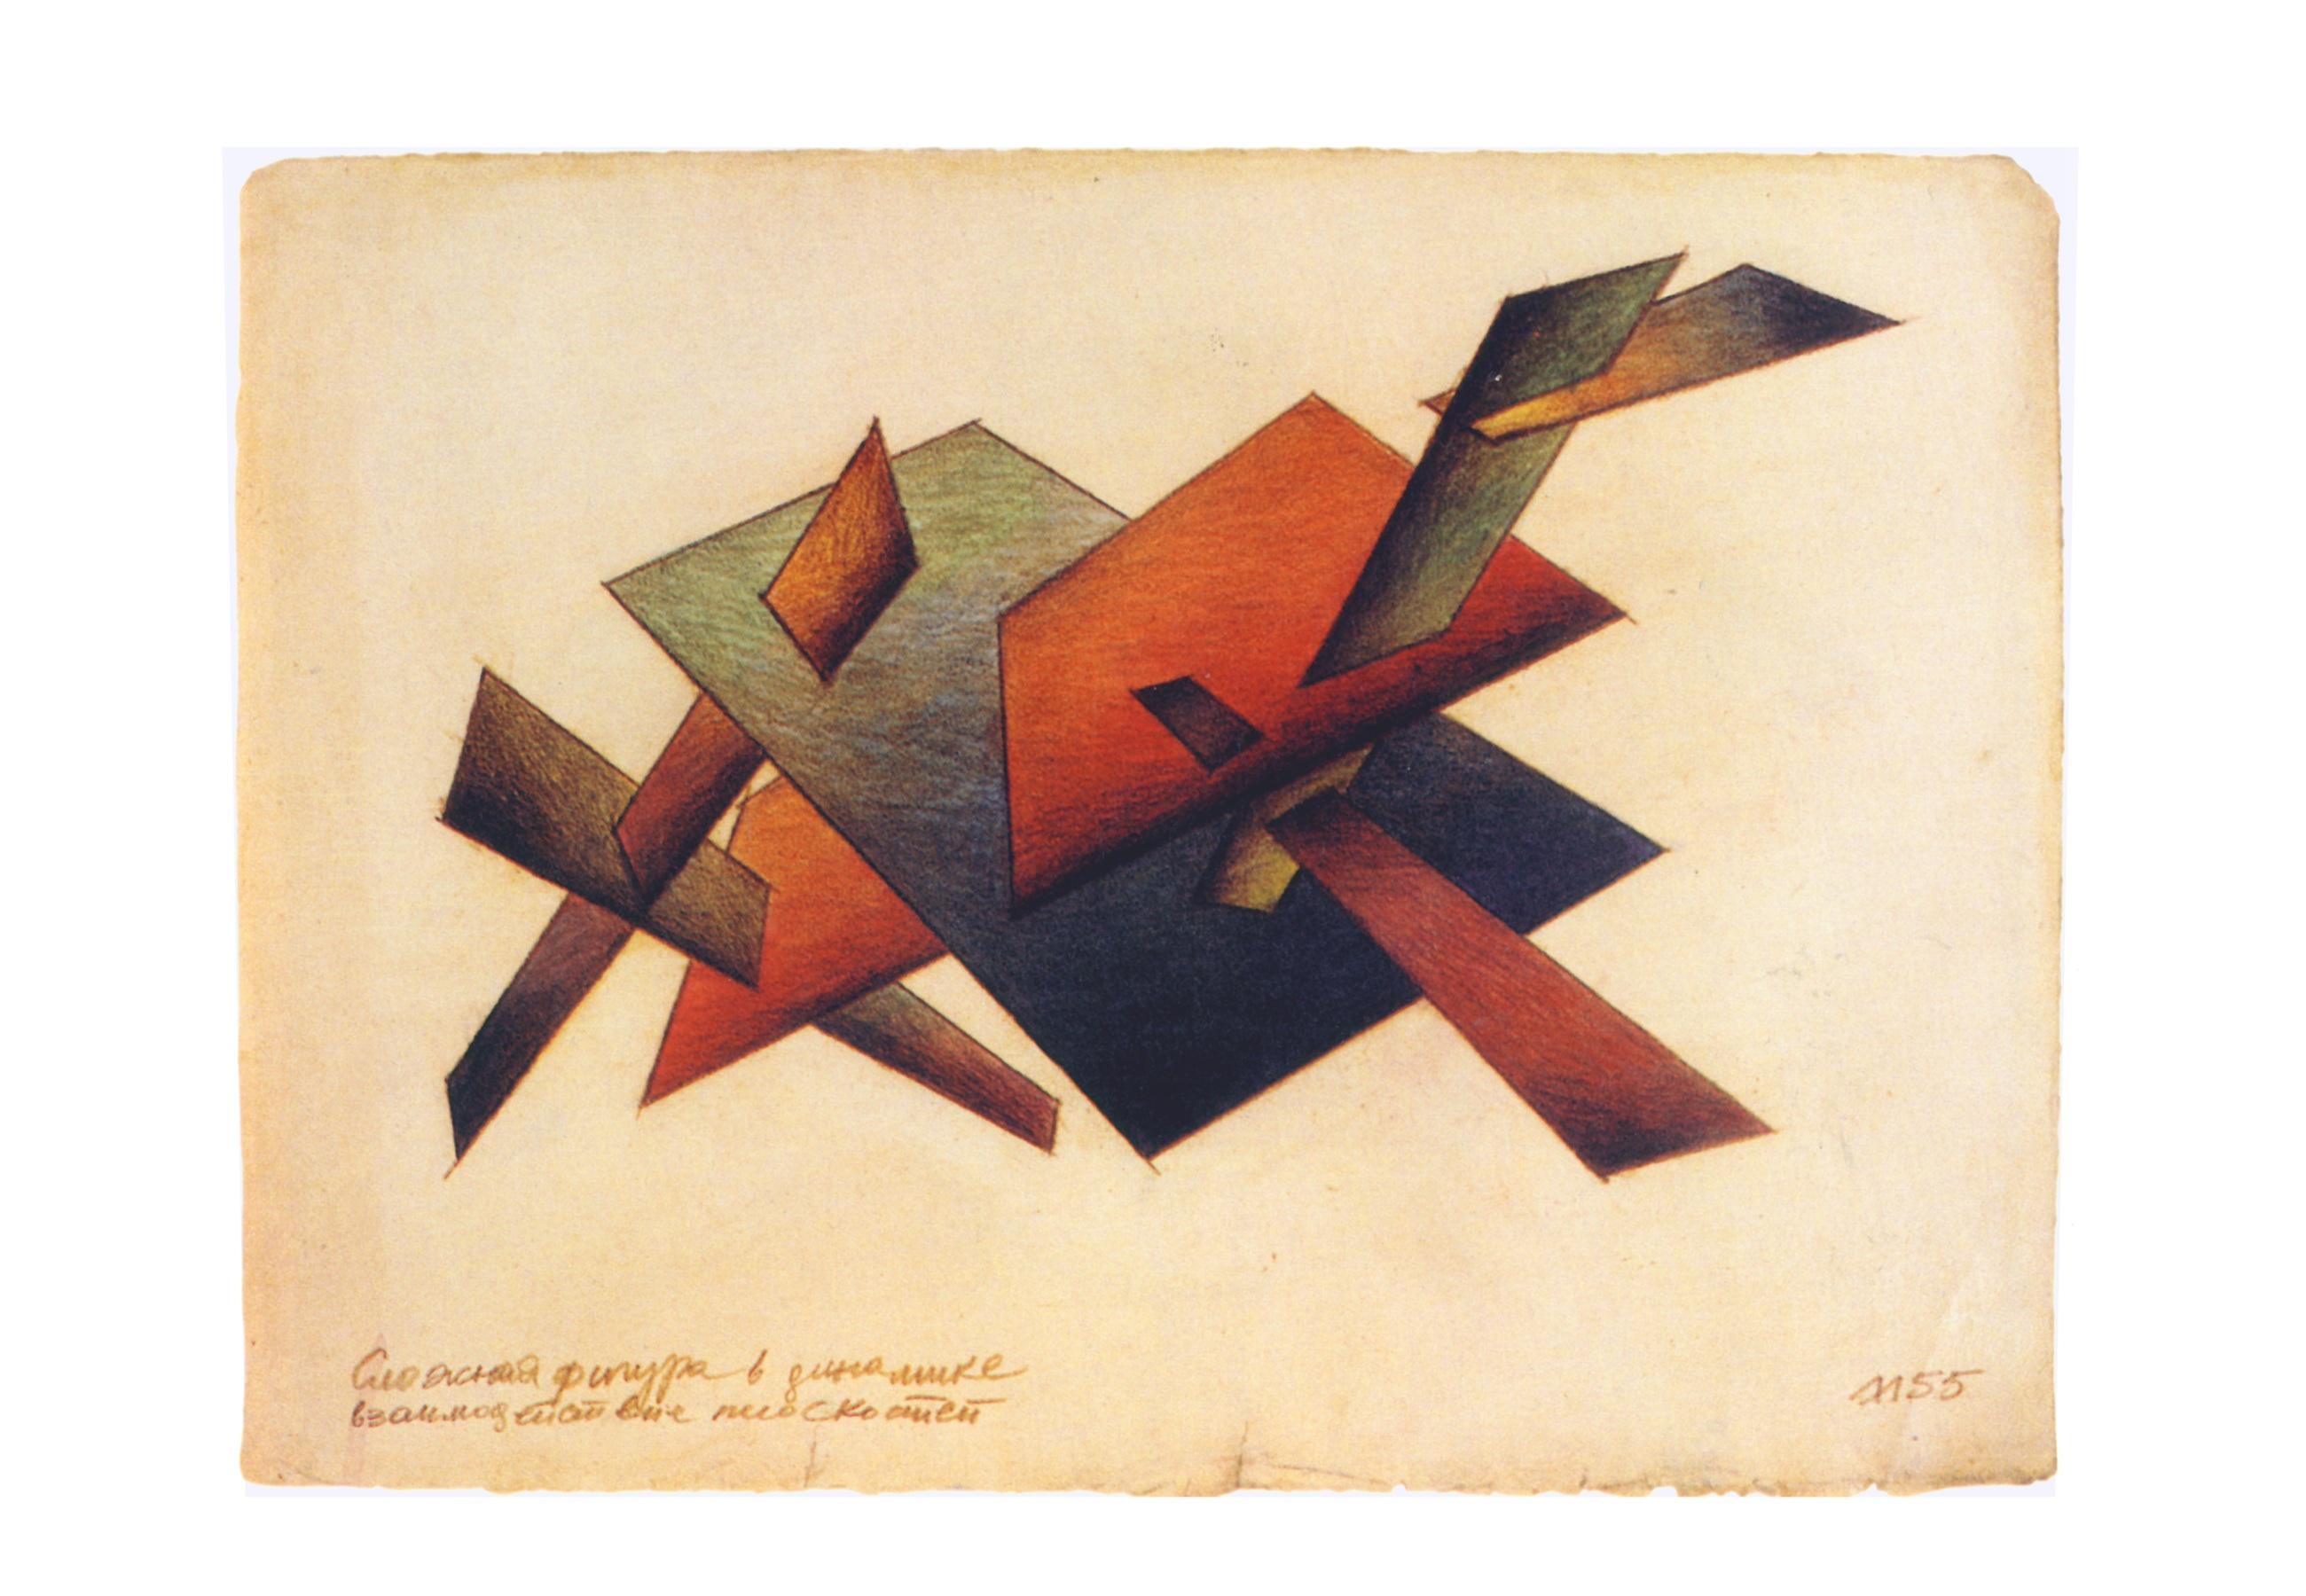 Lamm-Portfolio-1954-1955-19.jpg